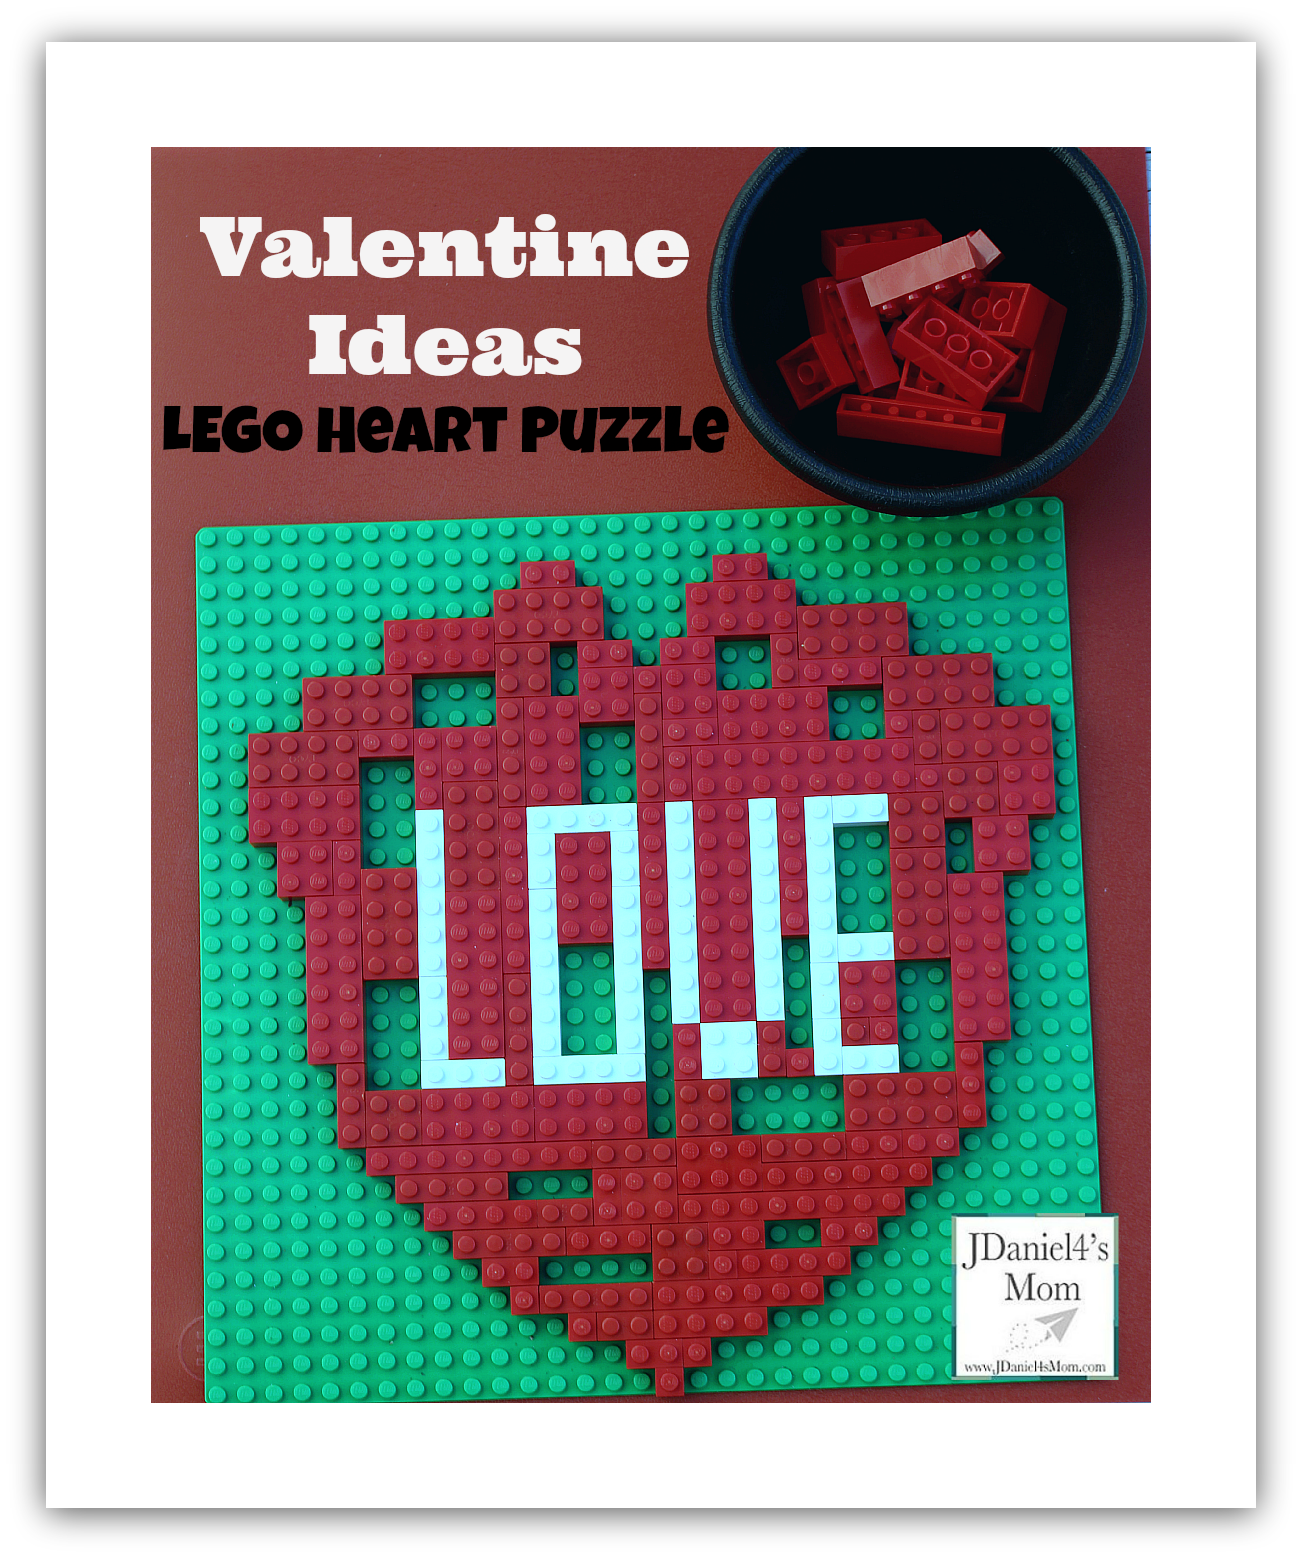 Valentine Idea LEGO Heart Puzzle